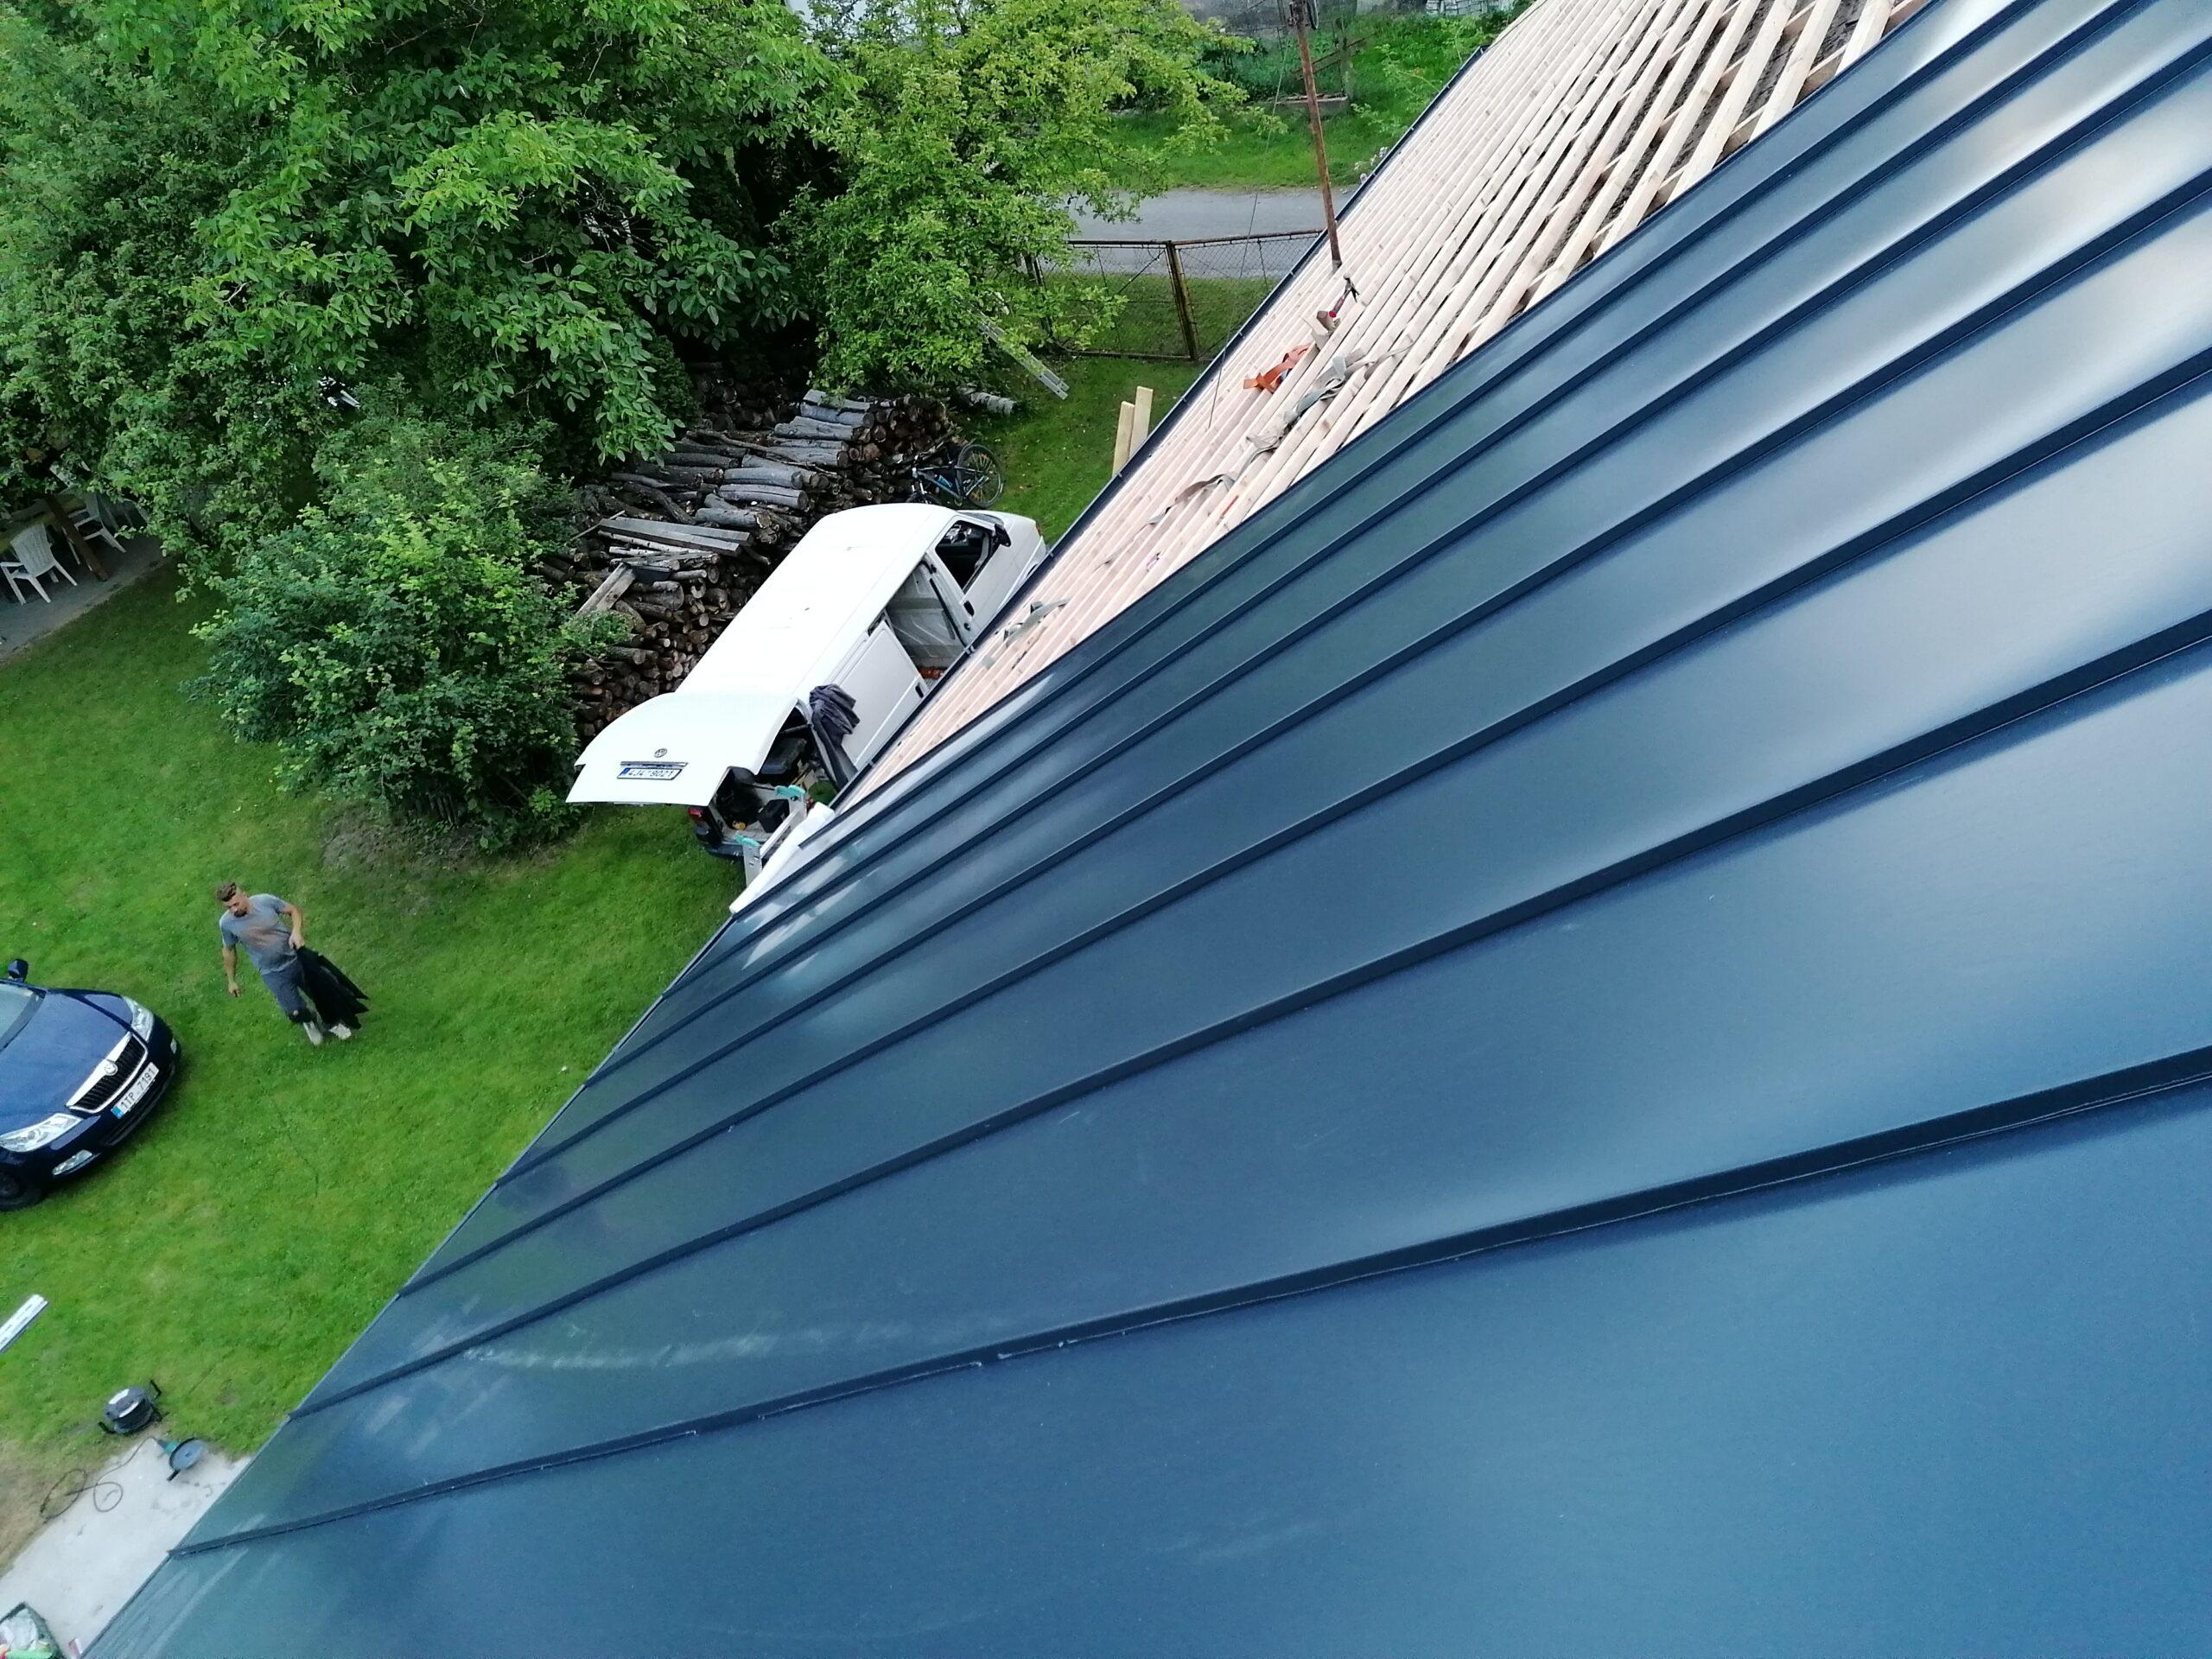 Rekonstrukce střechy – Povelice